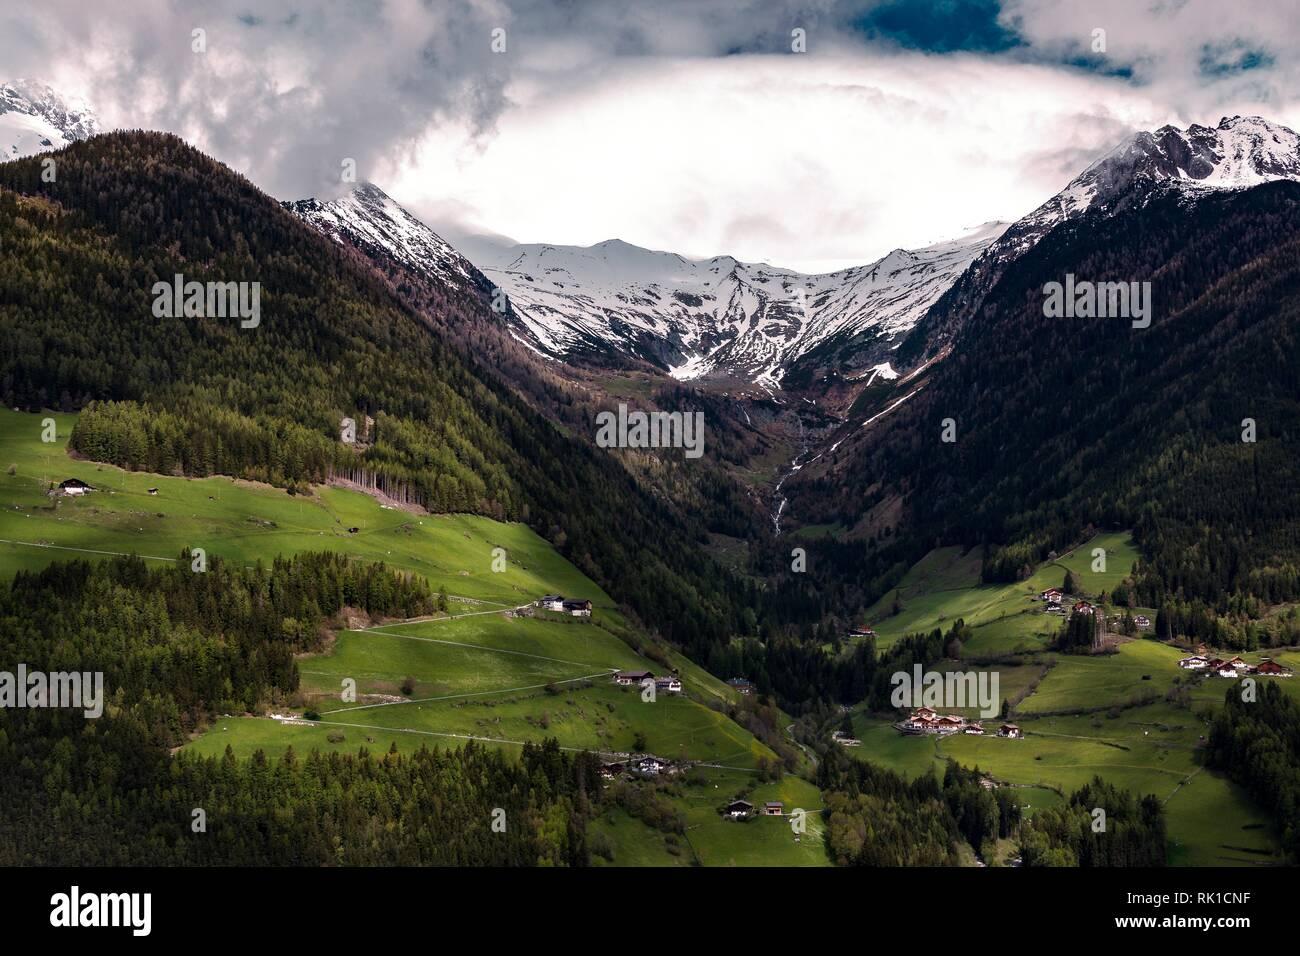 Cloudy mountain HD wallpaper - Stock Image